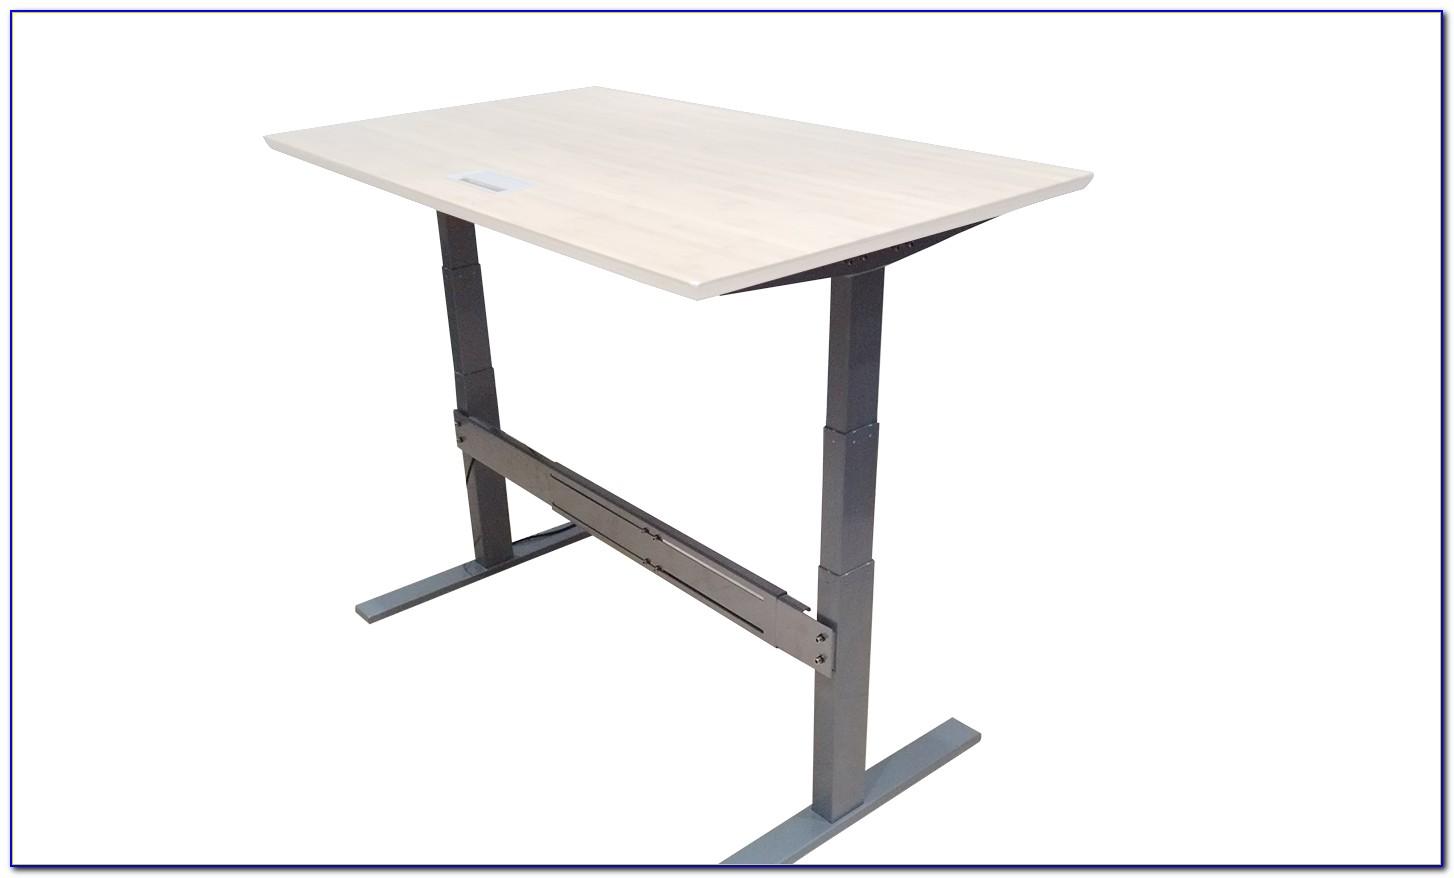 Standing Desk To Put On Top Of Regular Desk